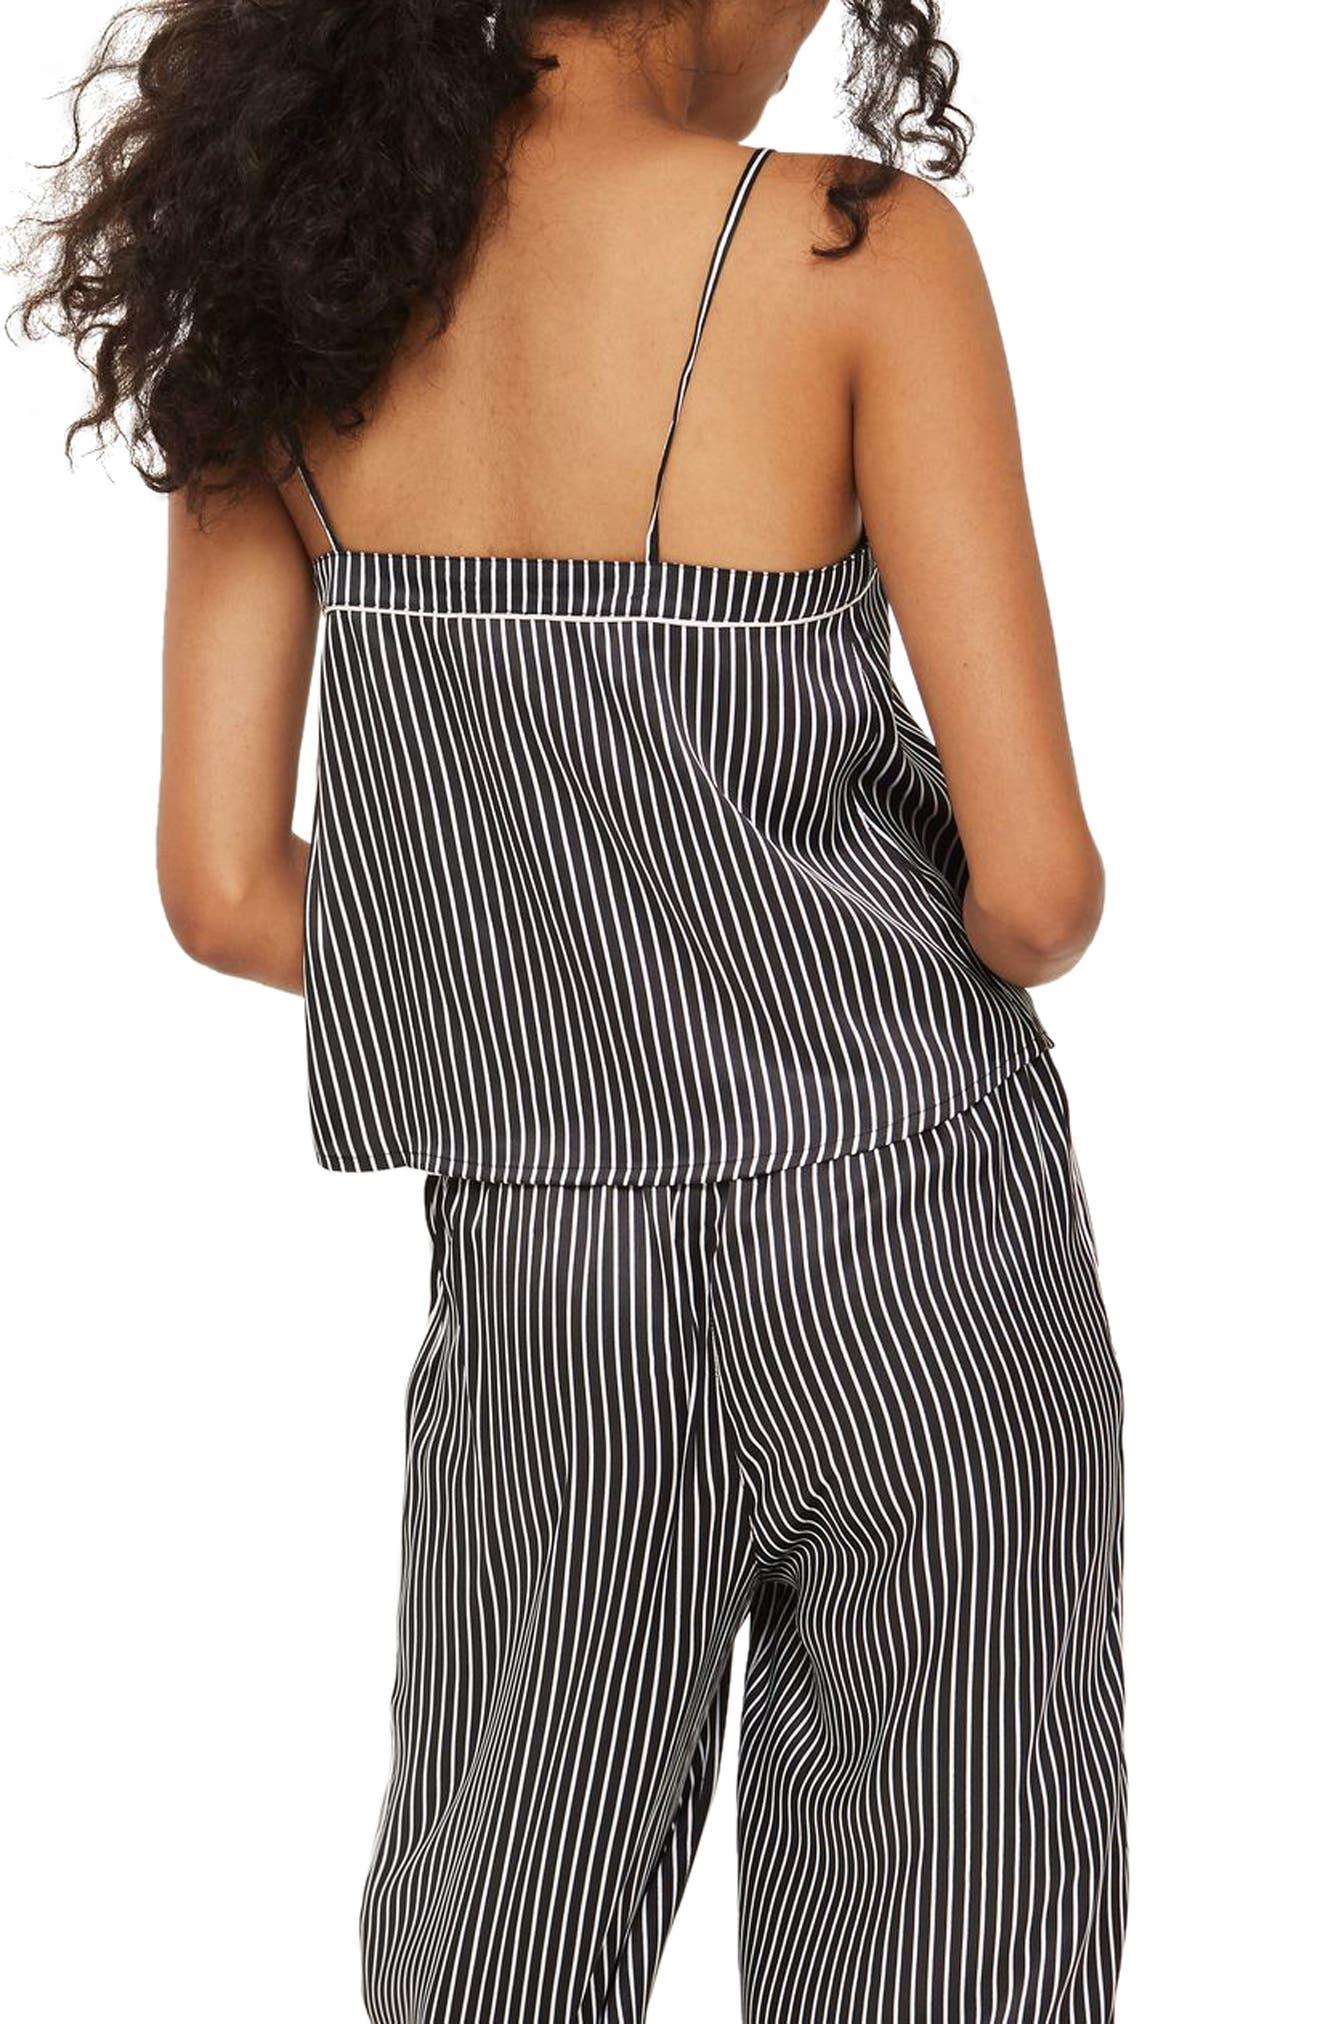 Stripe Satin Camisole Pajama Top,                             Alternate thumbnail 2, color,